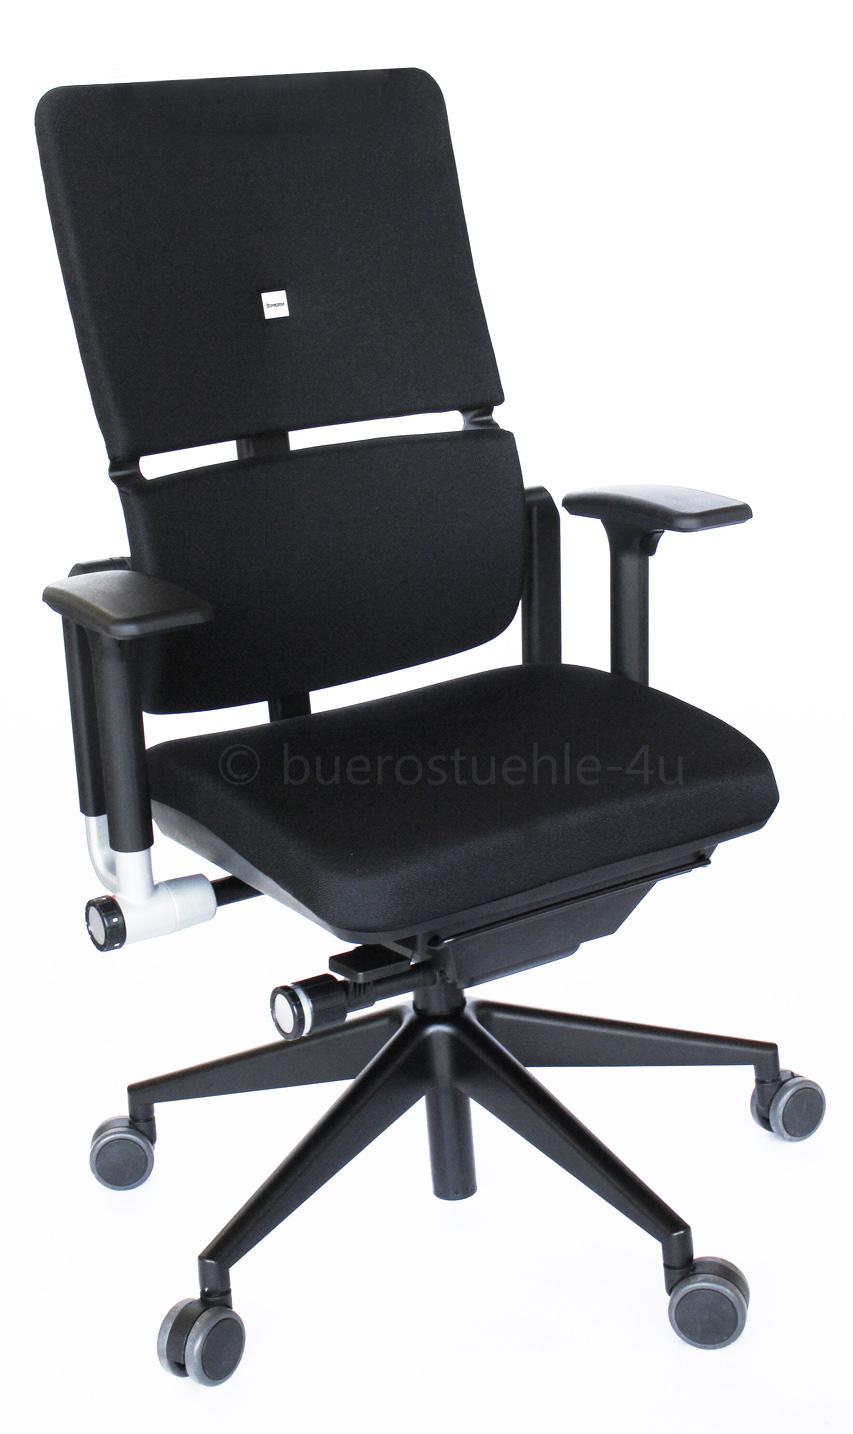 b rostuhl steelcase please mit mehr sitzh he bis 61cm buerostuehle. Black Bedroom Furniture Sets. Home Design Ideas